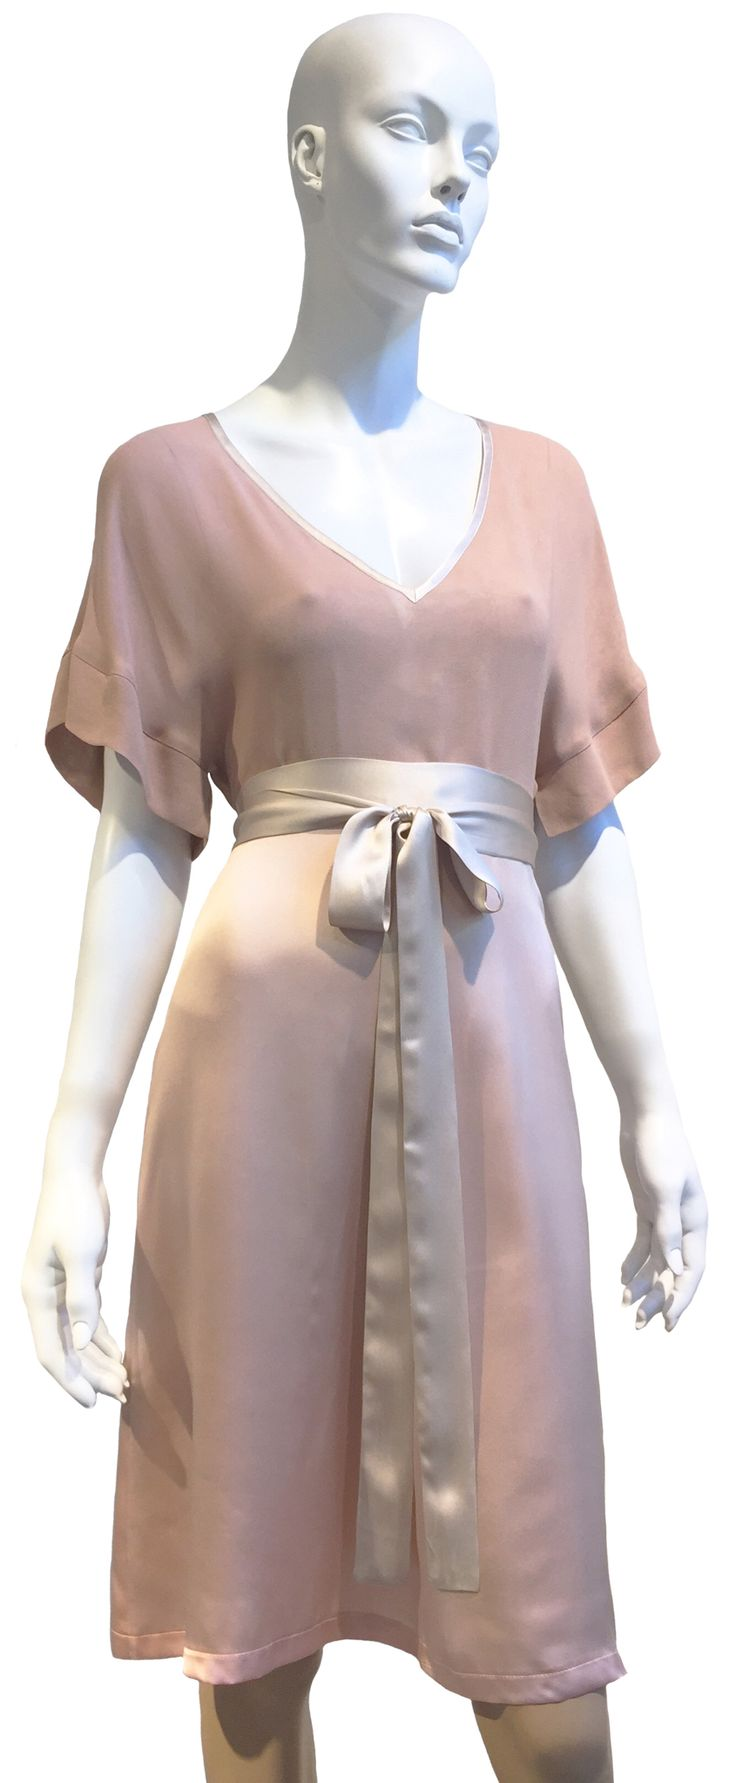 Summer Love silk dress in misty rose from Mette Møller SS2015 collection. www.mettemoller.no